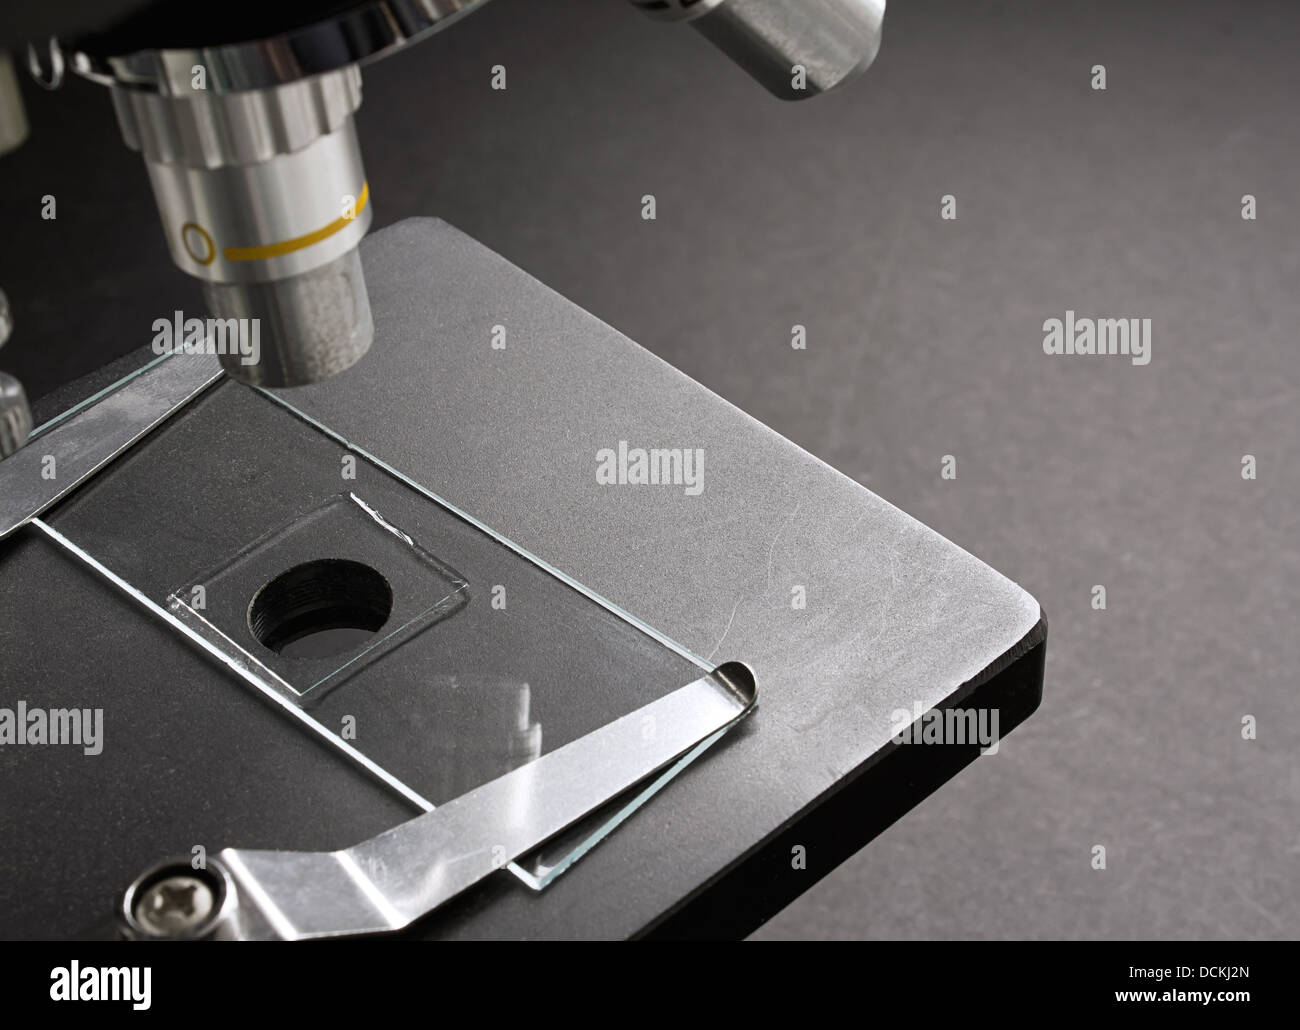 Microscopio con portaobjetos de vidrio montada sobre inspección microscópica de las células Imagen De Stock